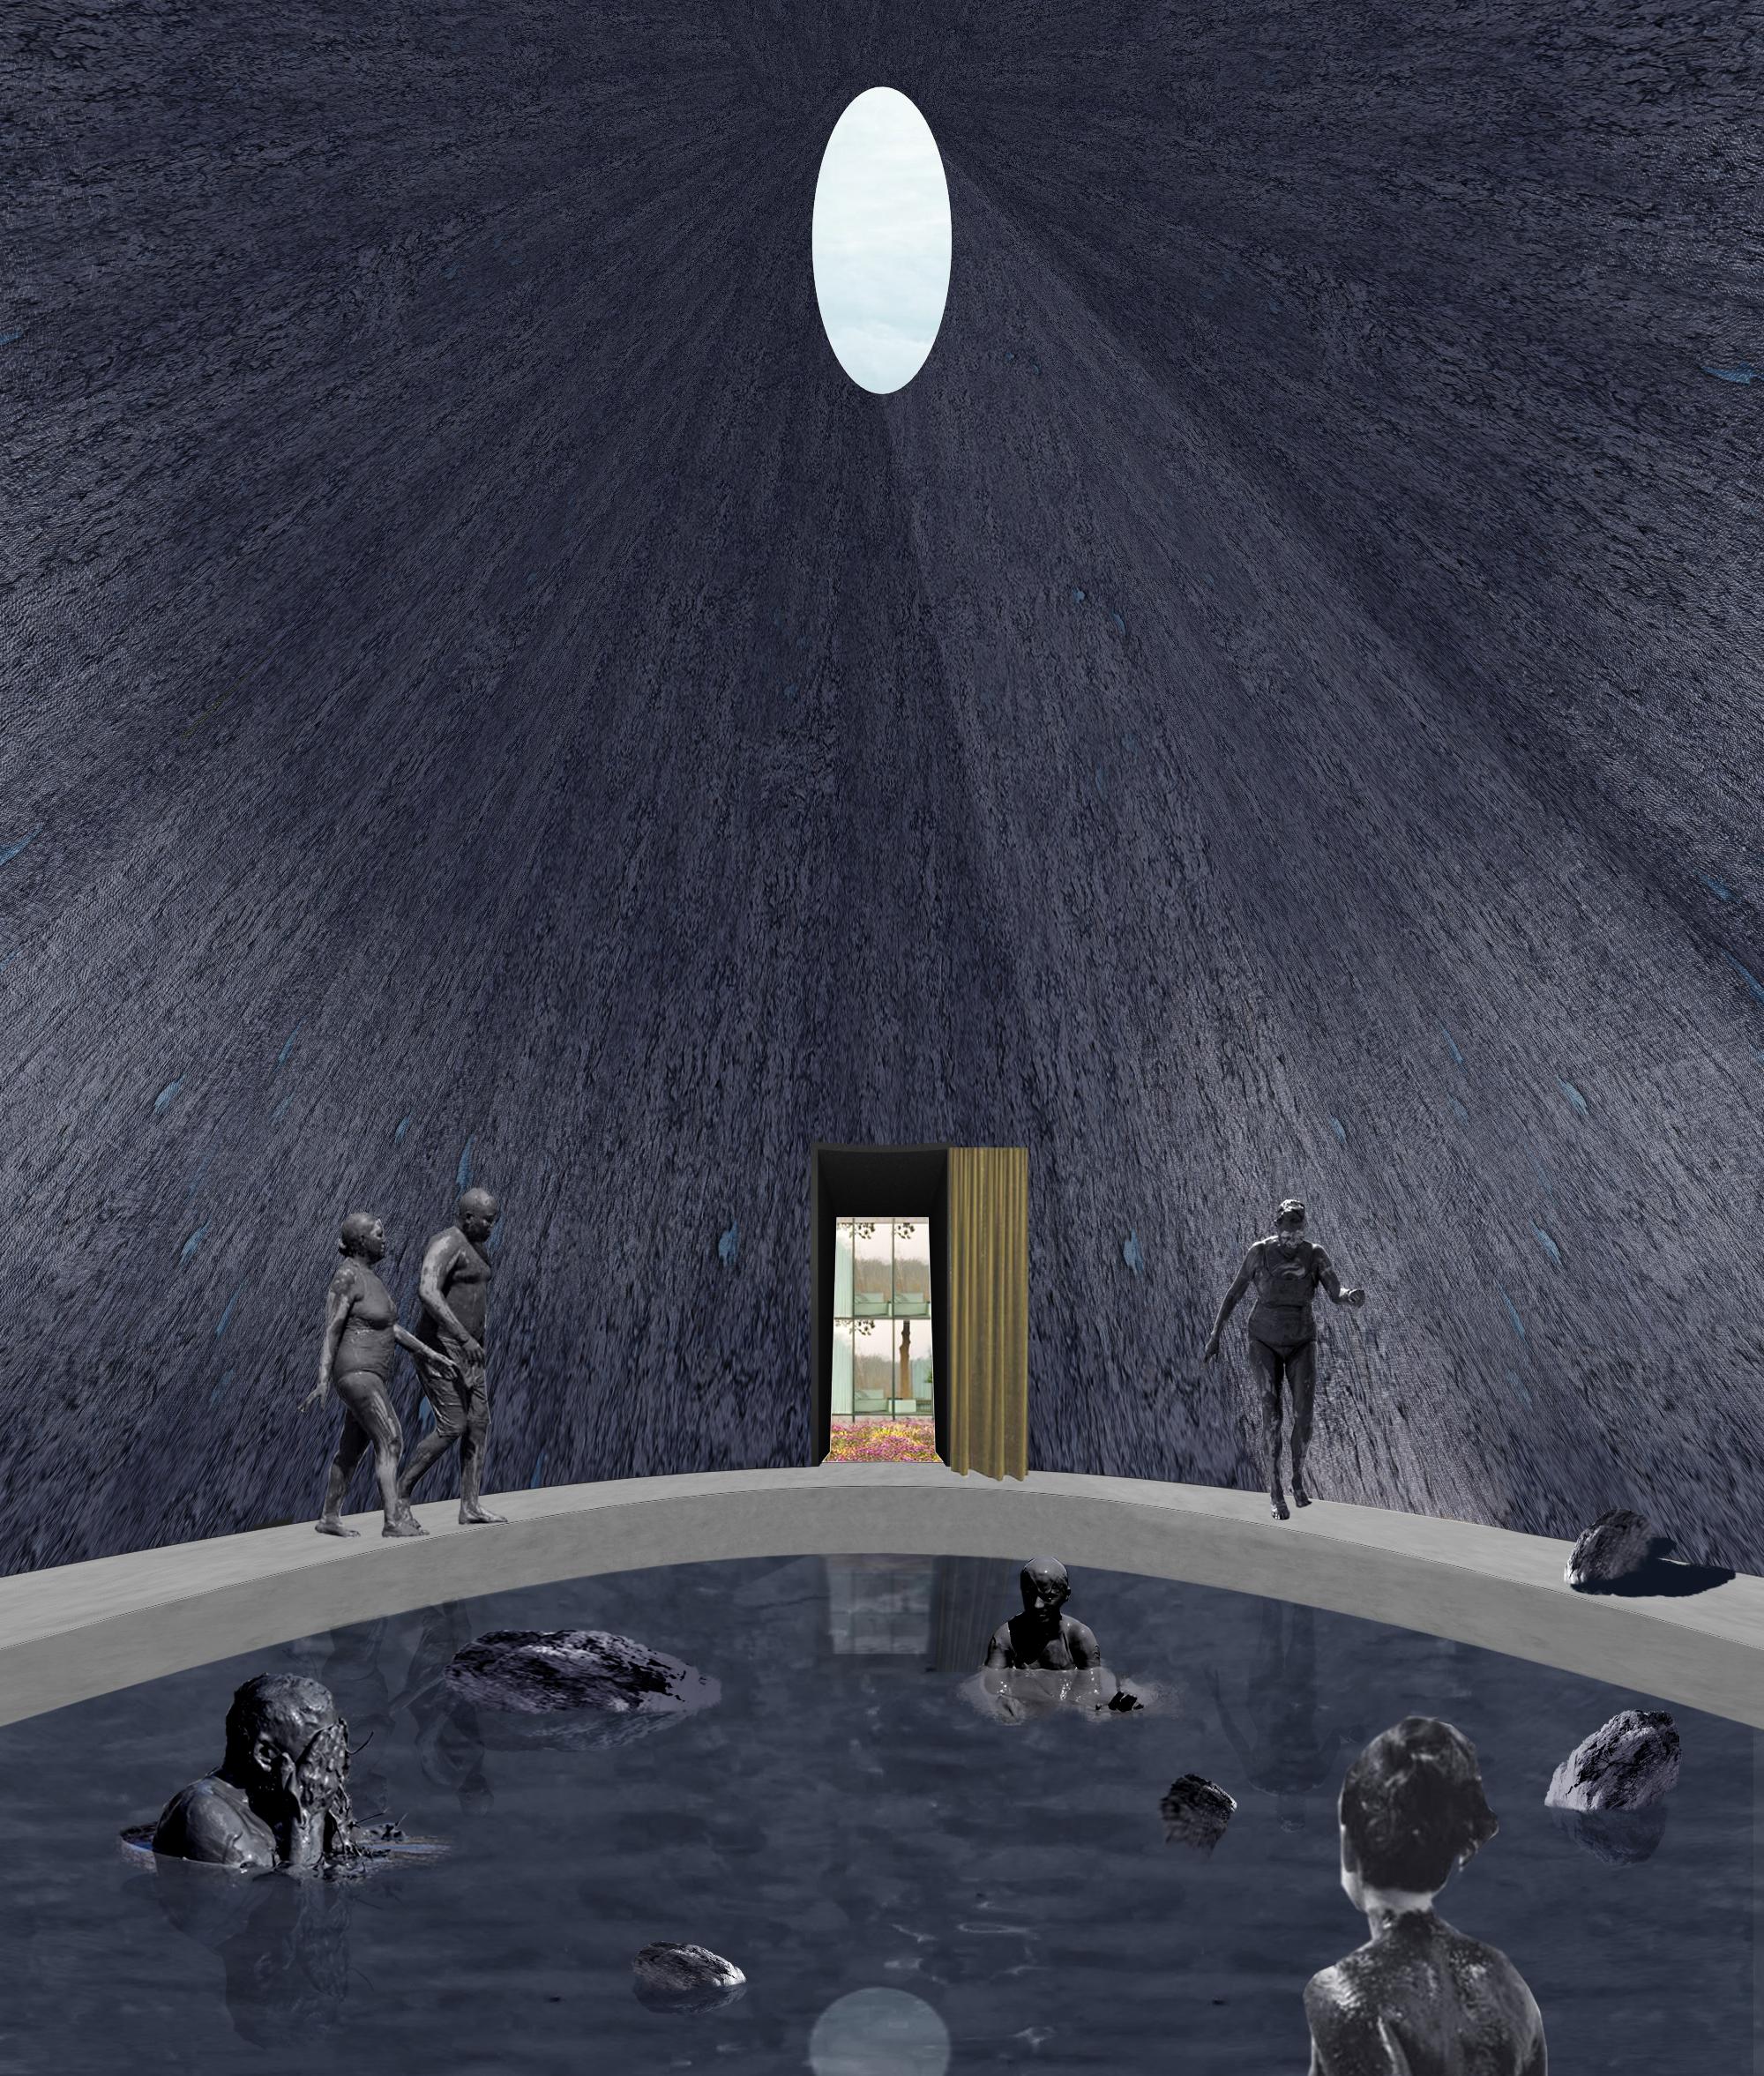 13-Sauna Room - View of Space Used as Clay Bath.jpg